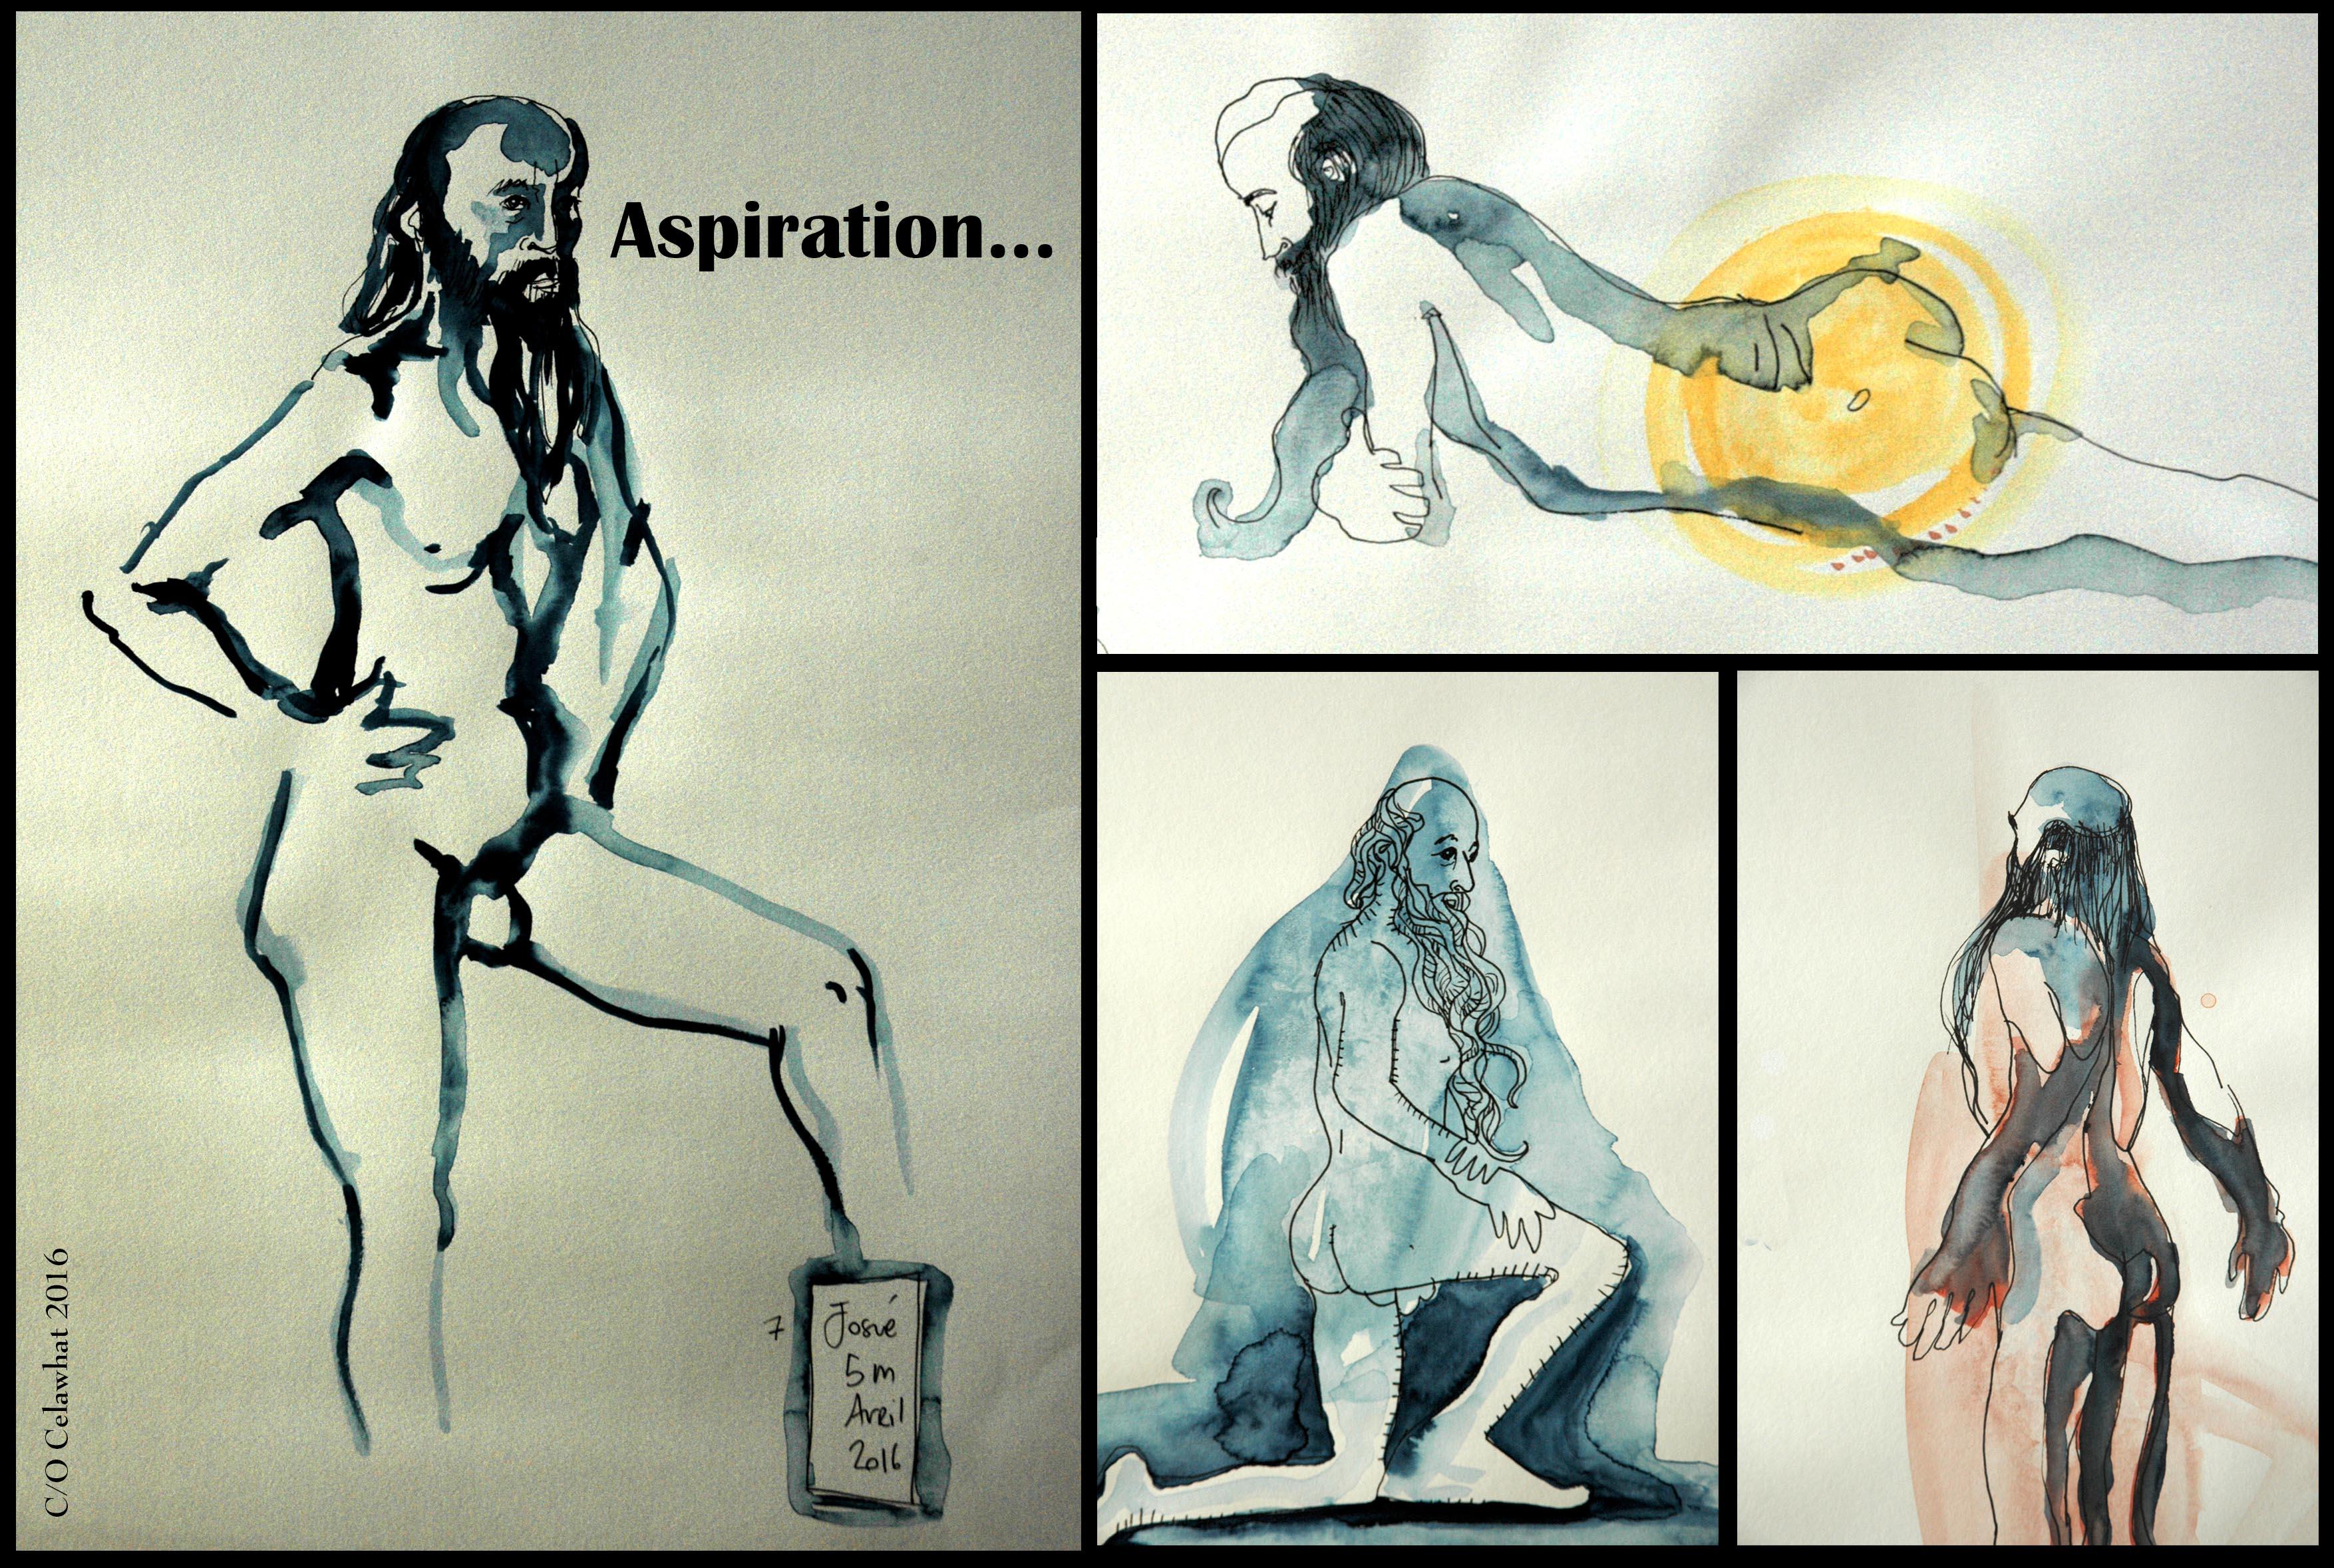 josue-aspiration-07